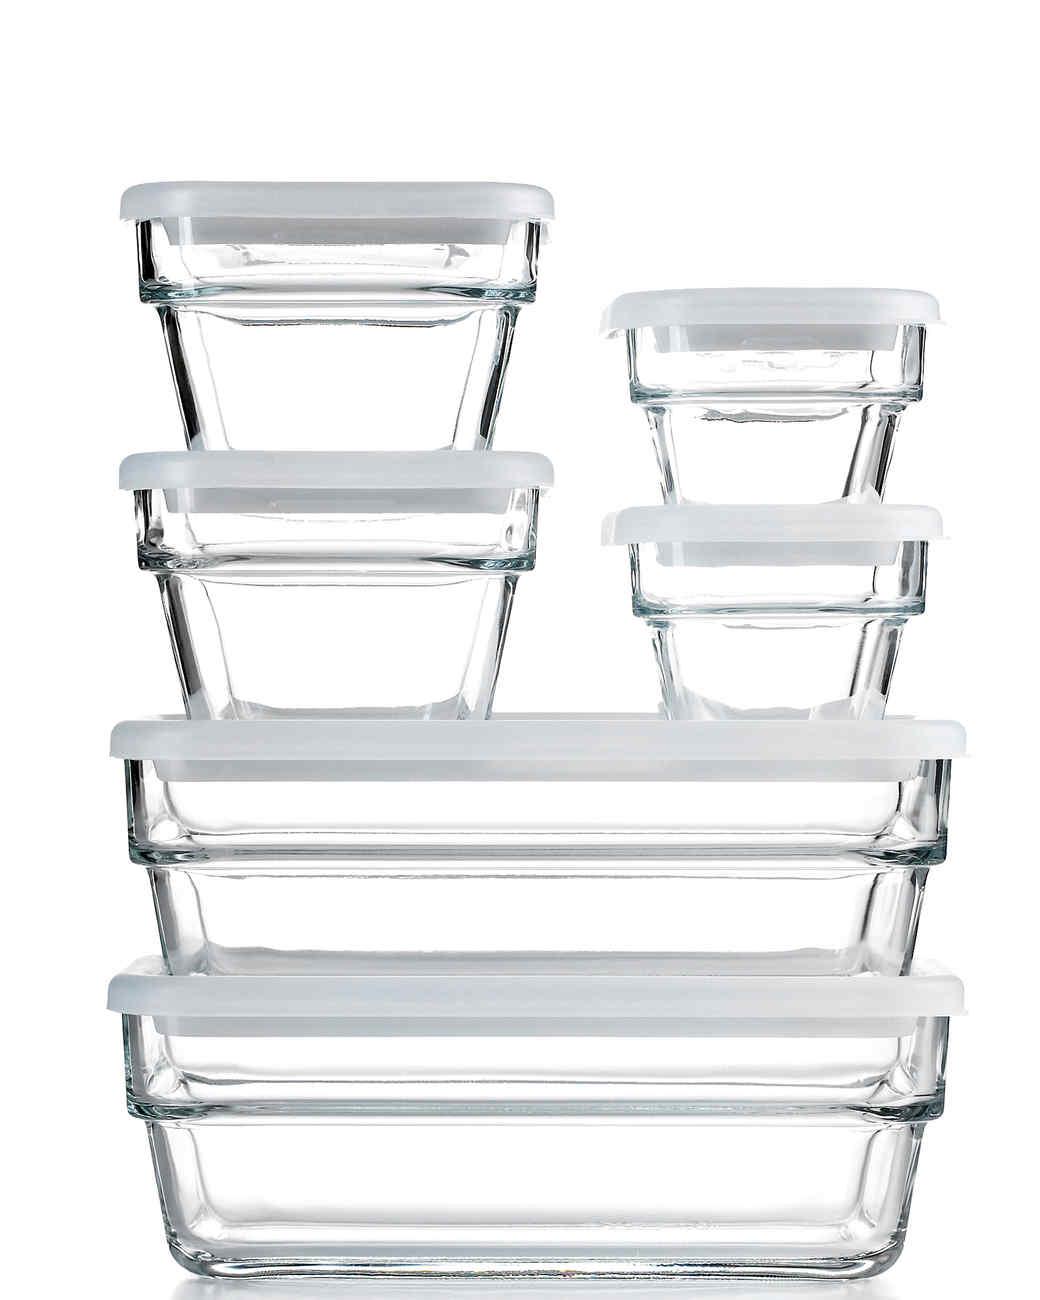 msmacys-glassfoodstoragecontainerset-retail-0414.jpg